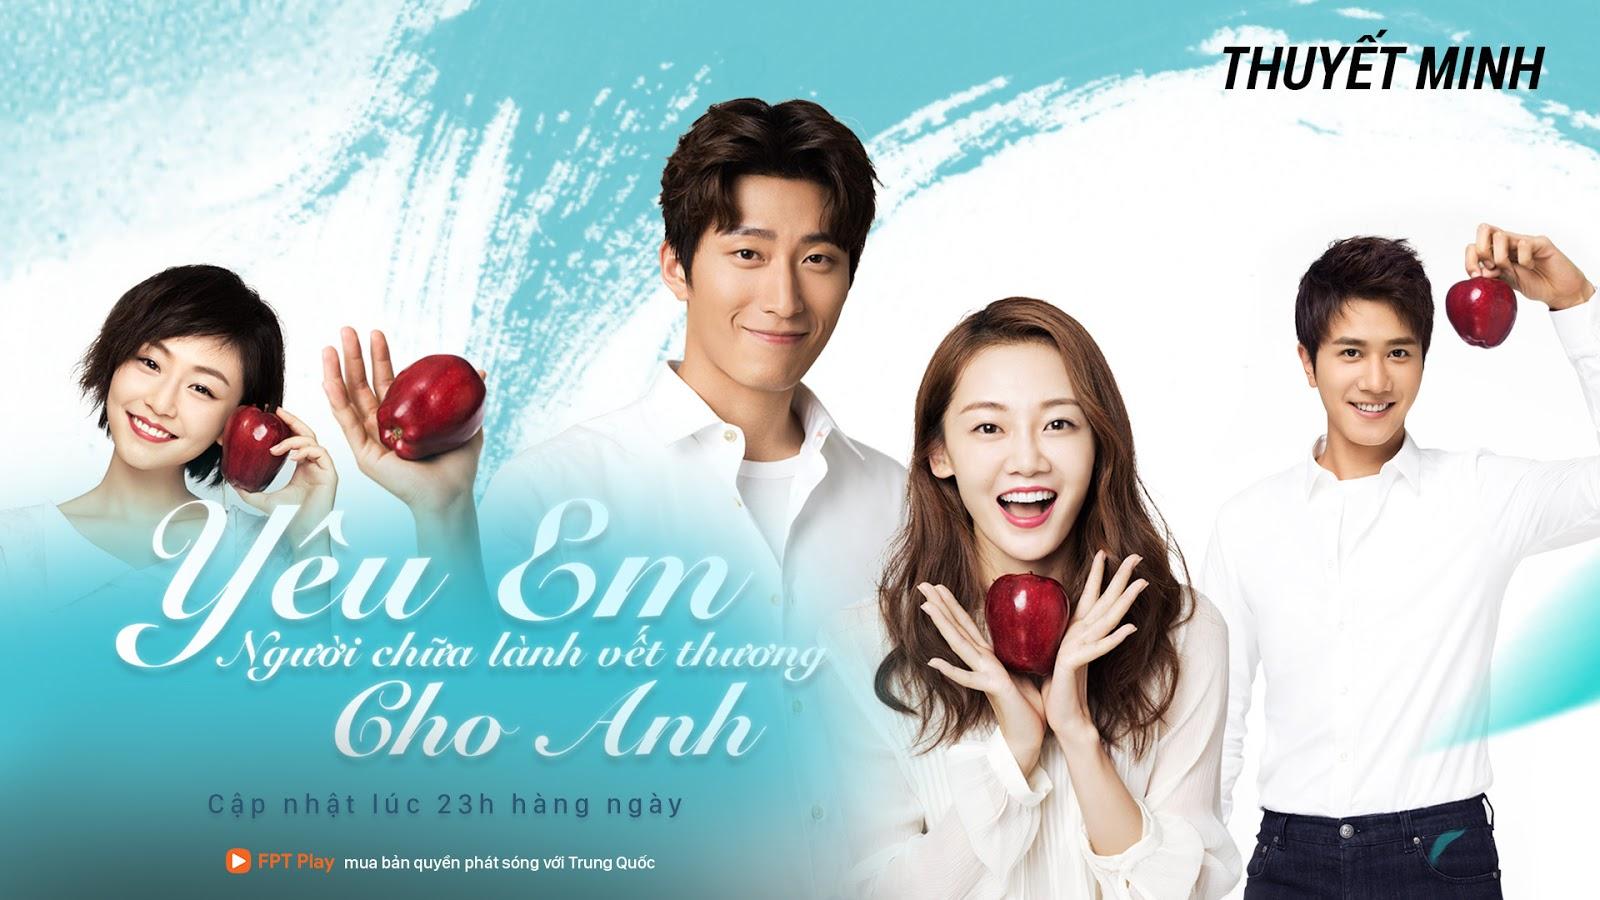 yeu-em-nguoi-chua-lanh-vet-thuong-2019-big